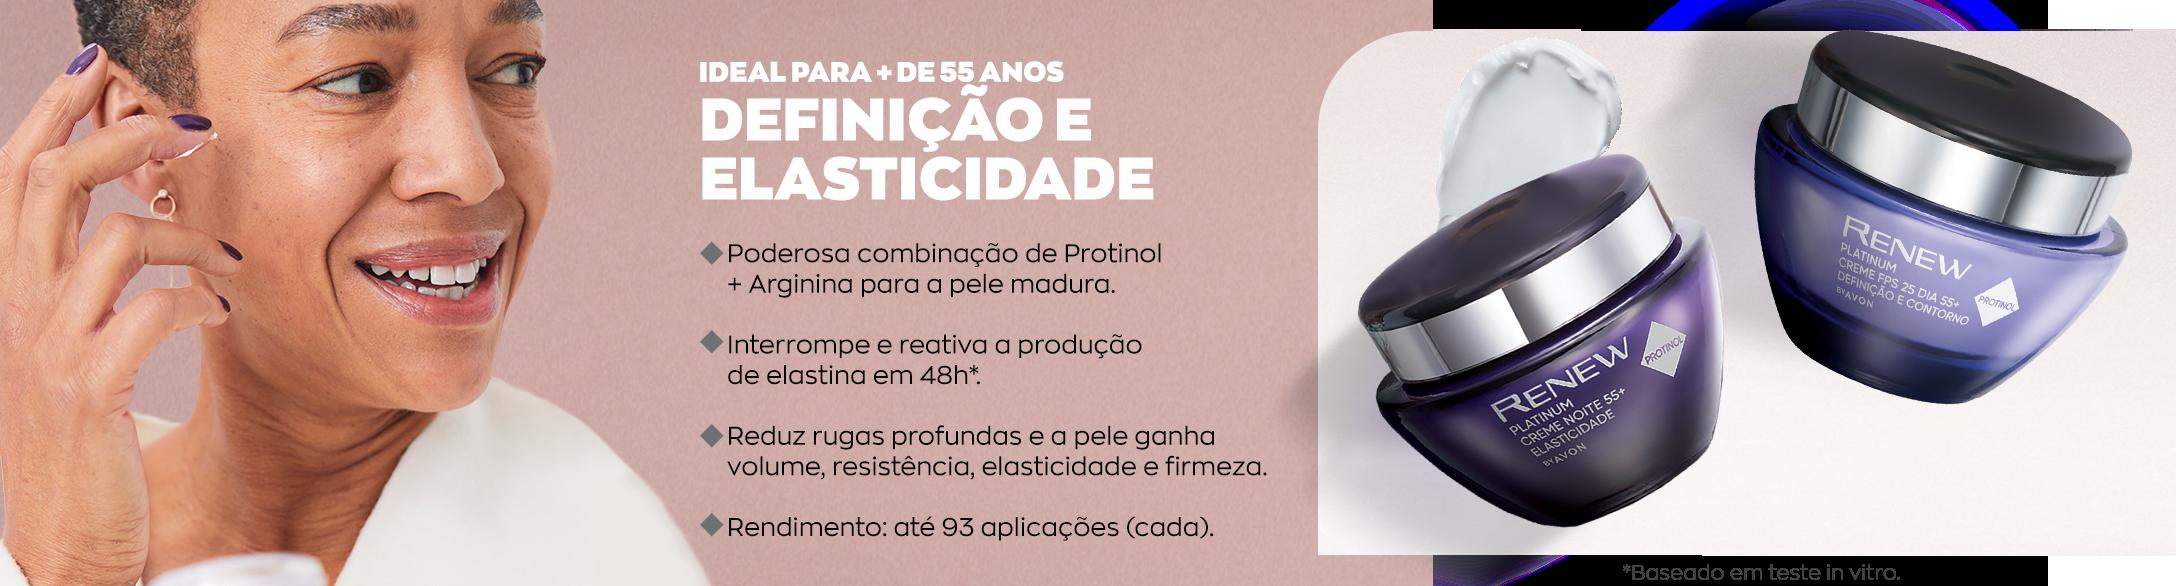 Banner Cuidado Diário